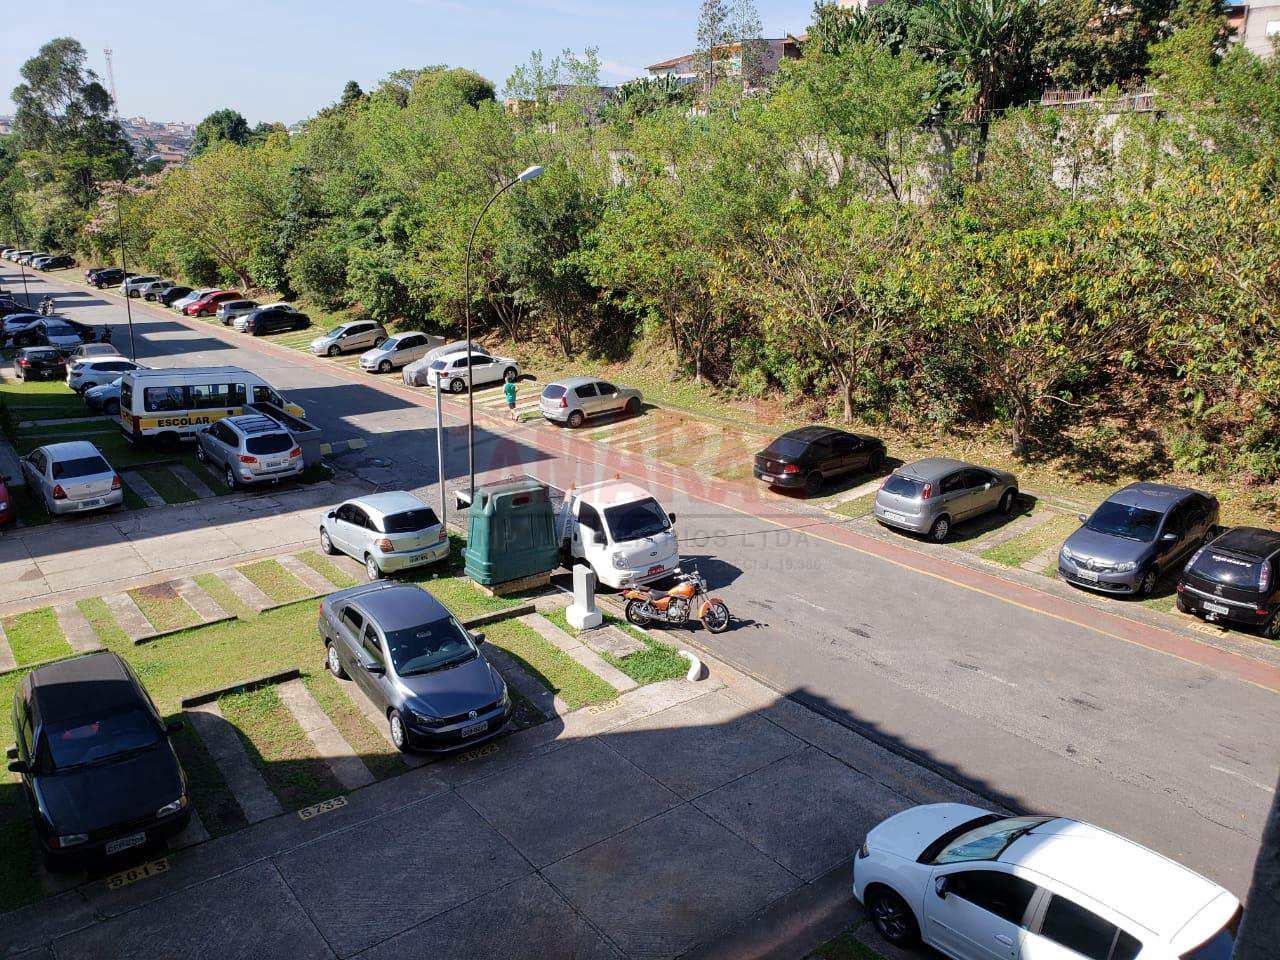 Apartamento com 2 dorms, Cidade Satélite Santa Bárbara, São Paulo - R$ 165 mil, Cod: 10750